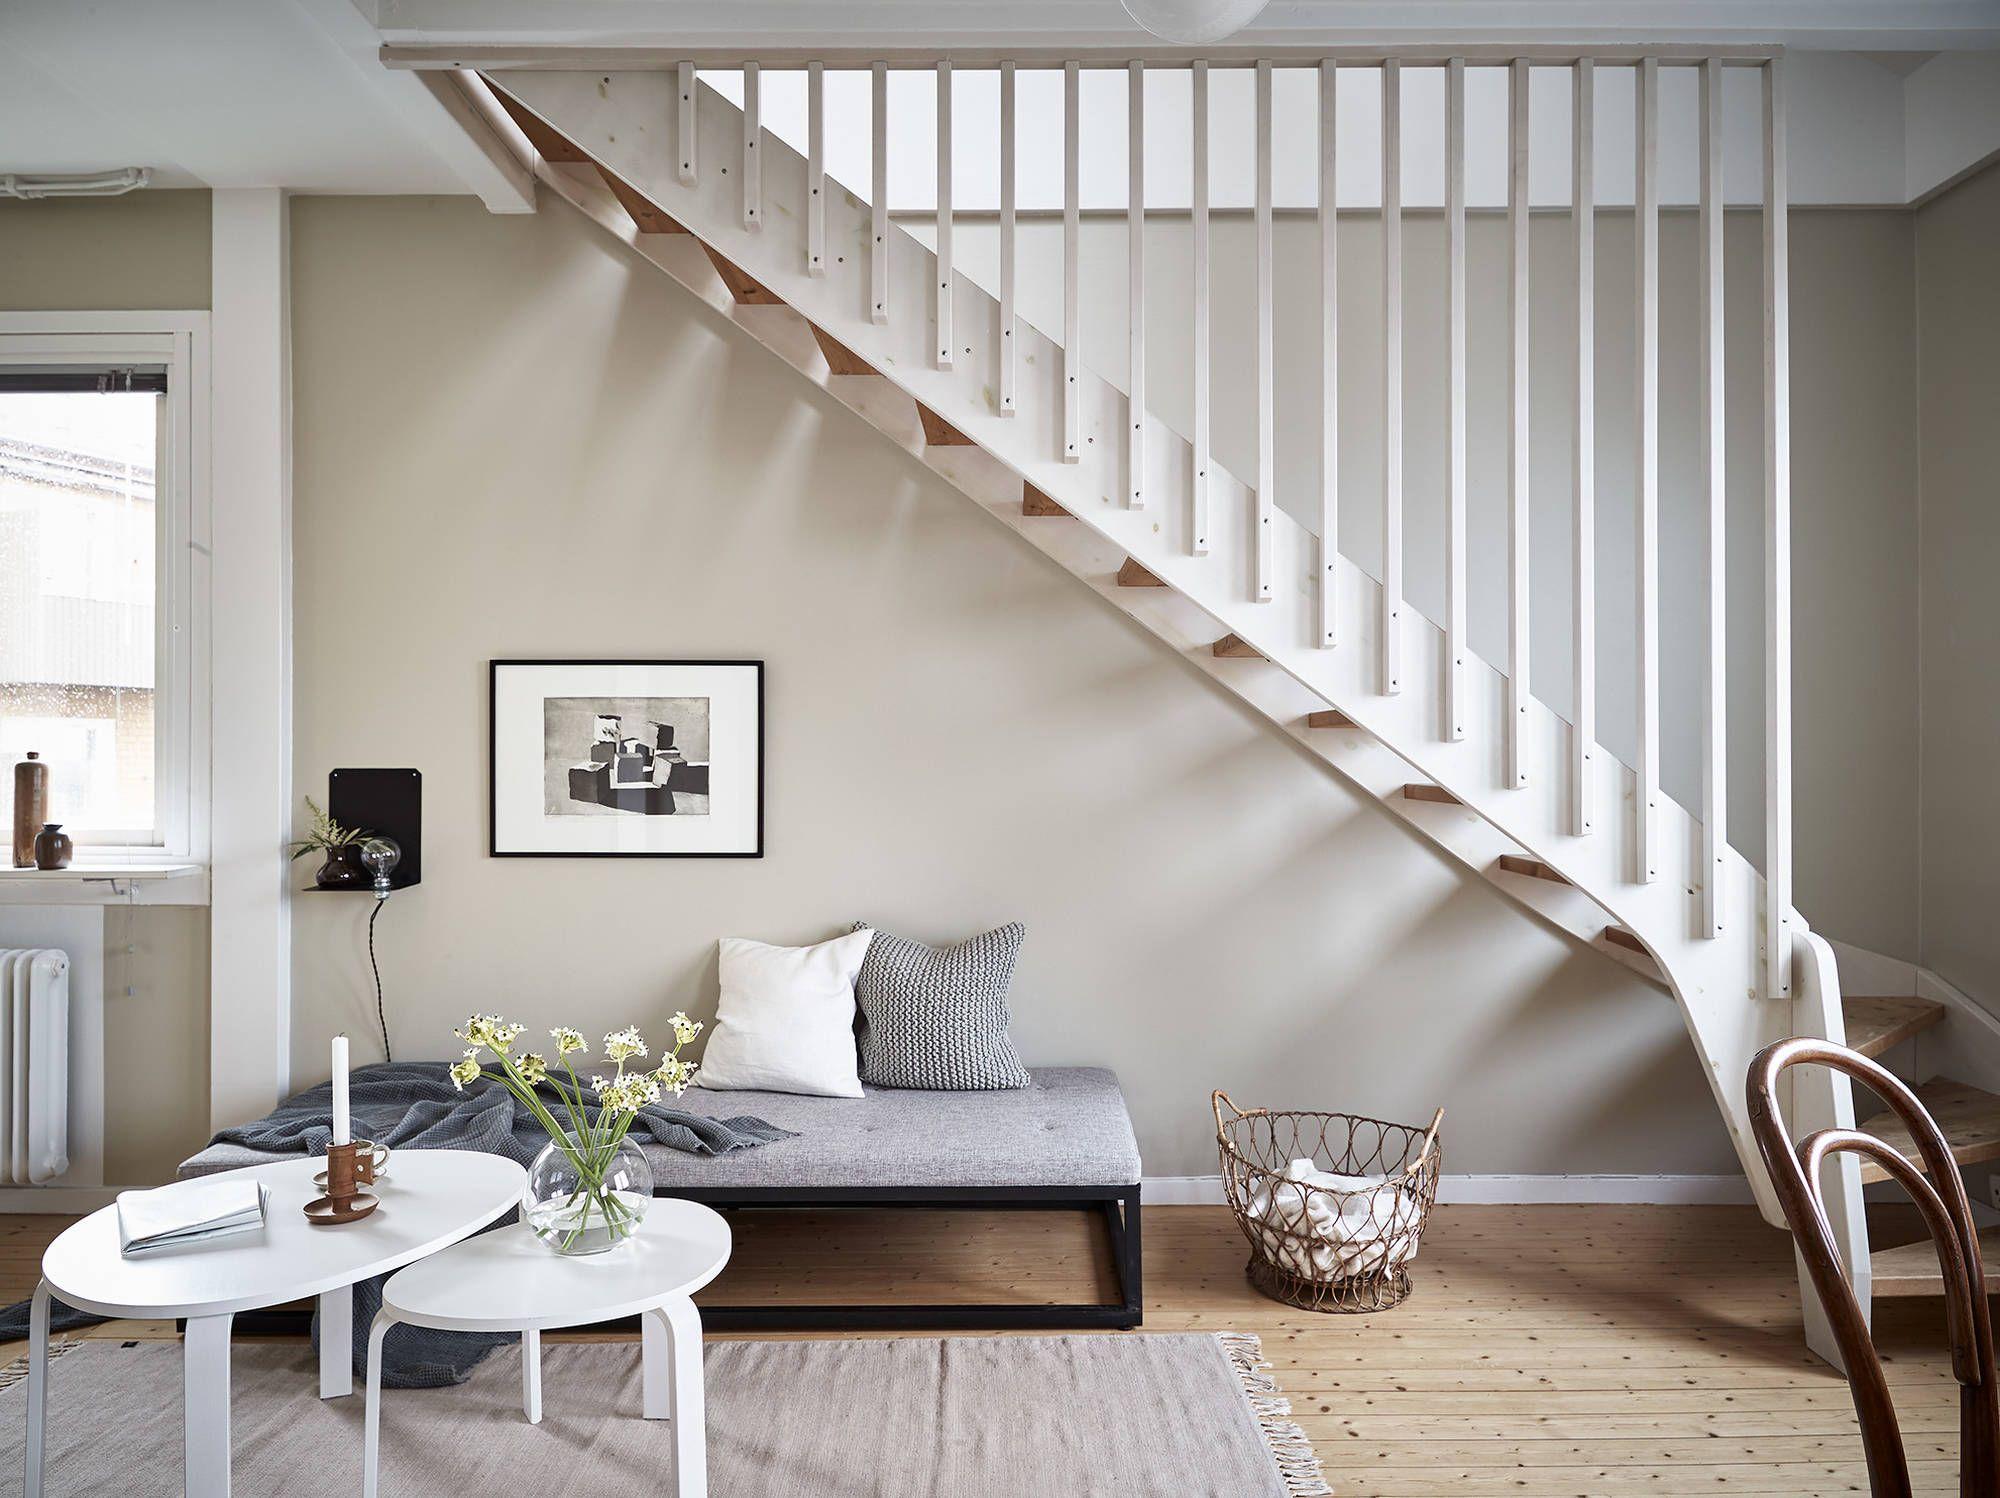 Amazing Greige Living Room Image - Living Room Design Ideas ...